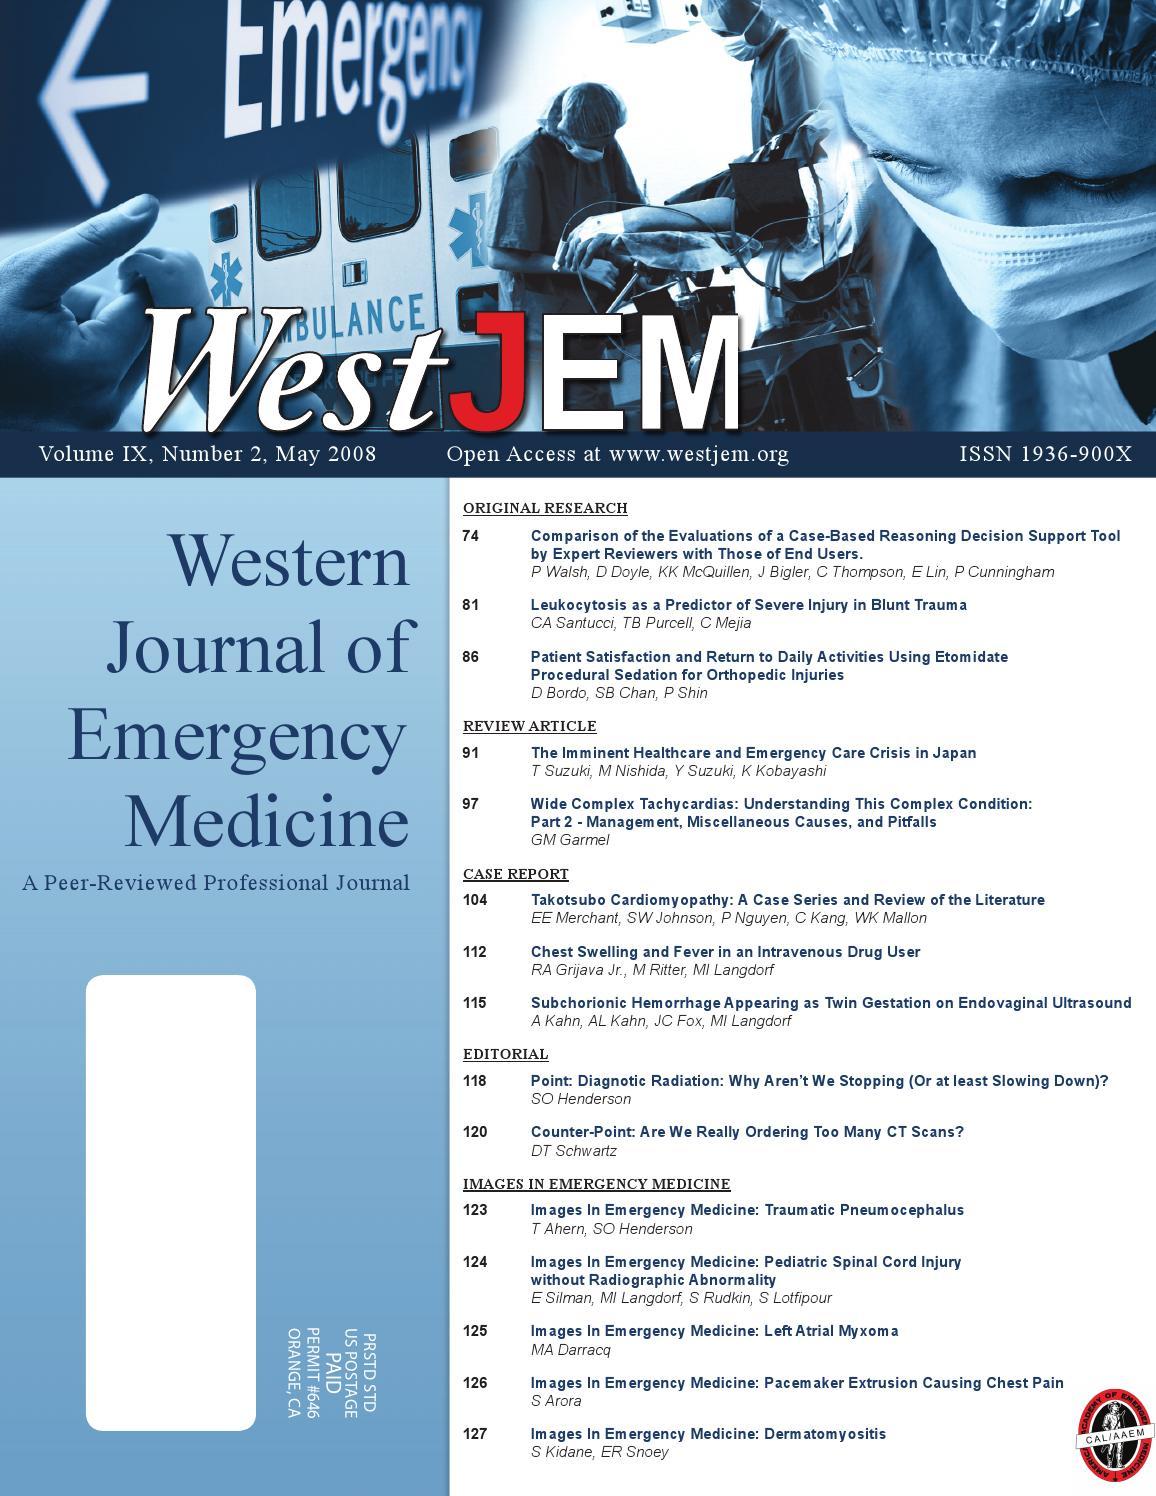 Volume 9 Issue 2 By Western Journal Of Emergency Medicine Issuu 20059 Hopkins Wiring Diagram